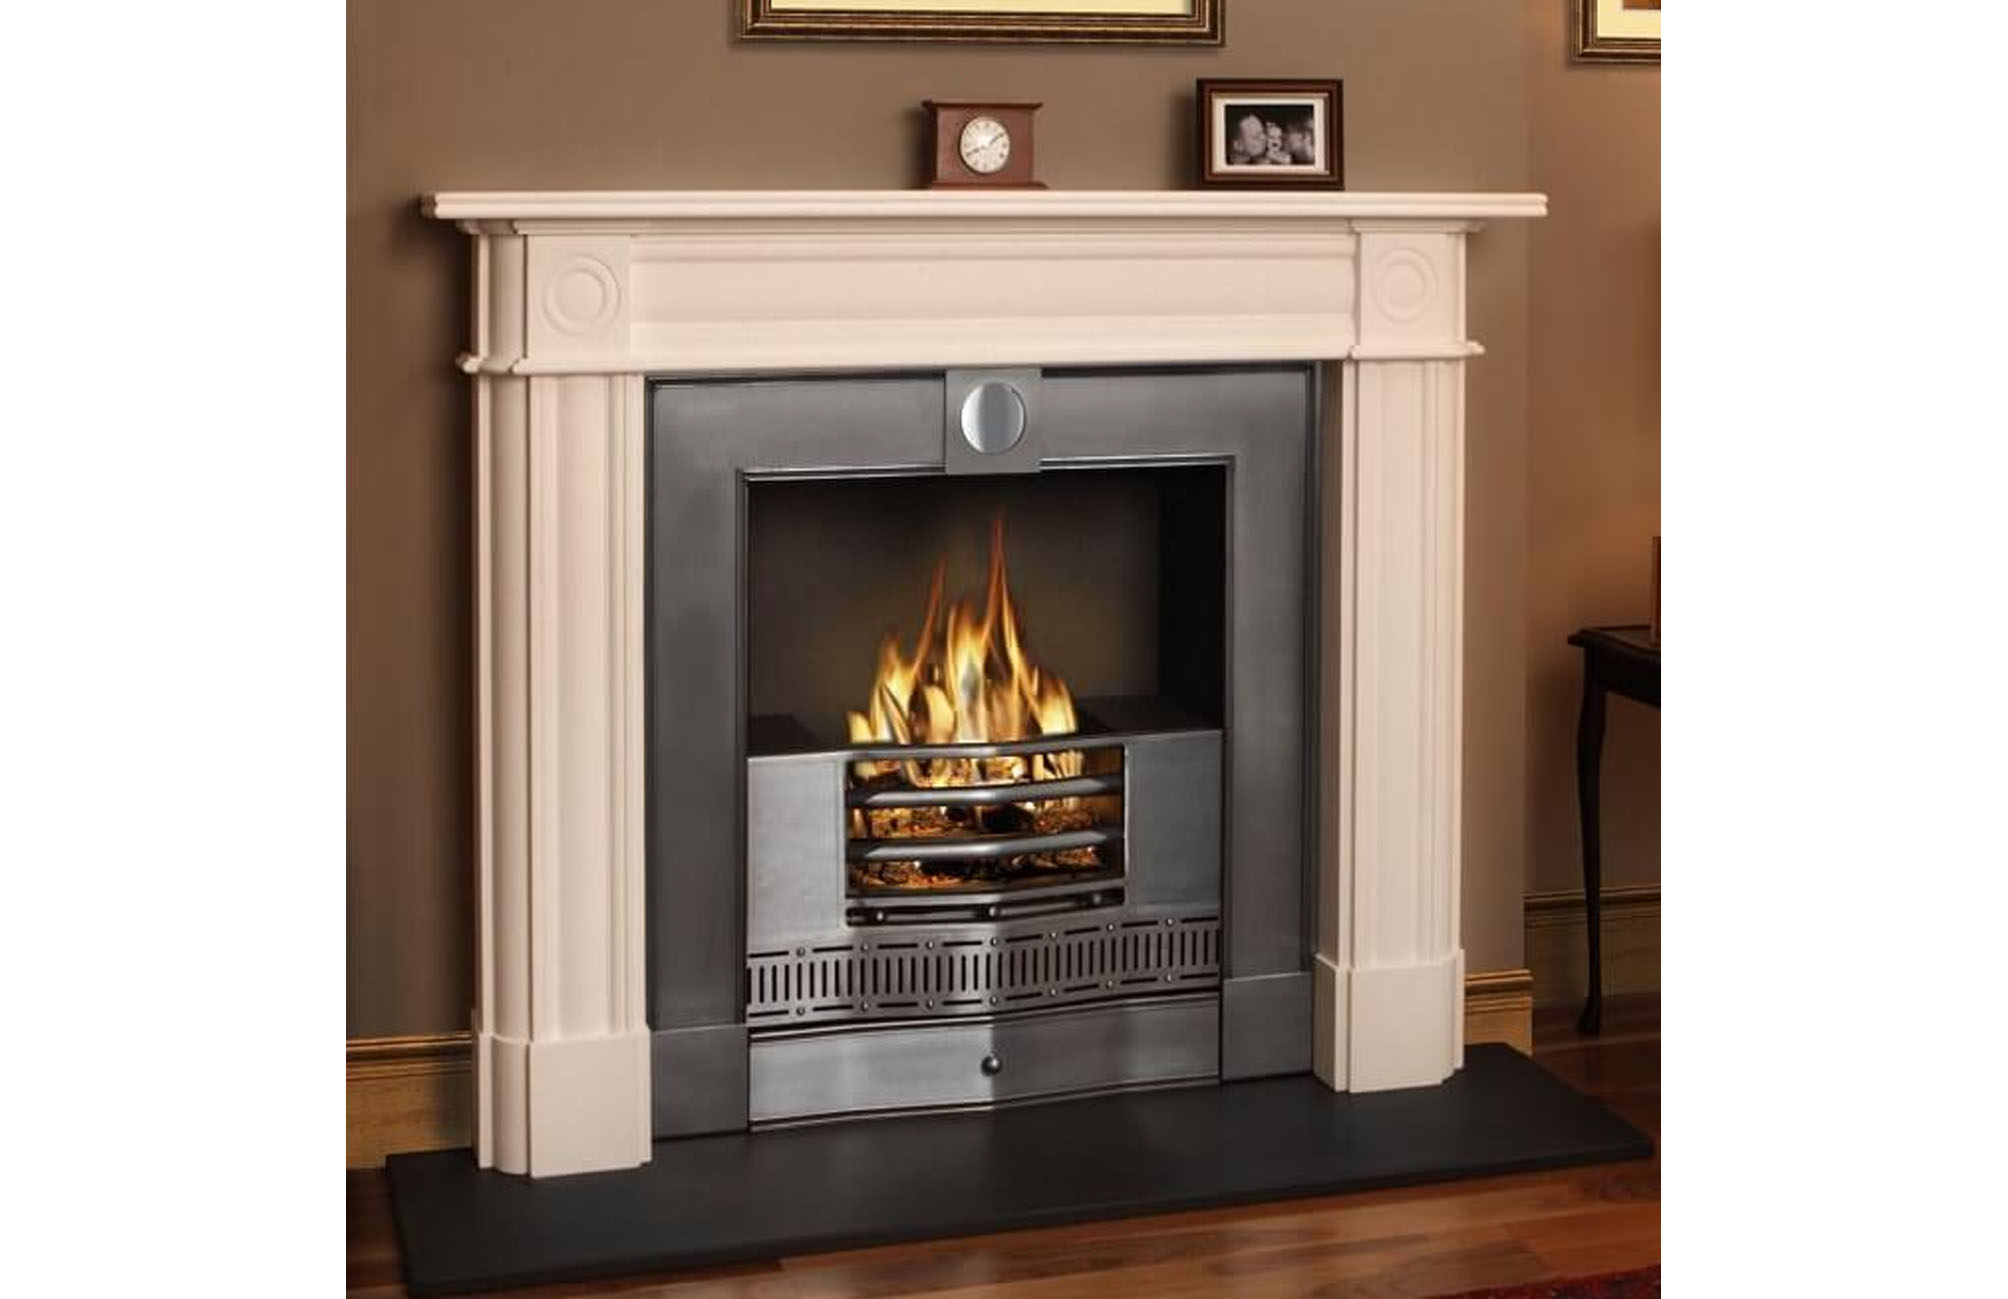 regency hob grate insert fireplace stonewoods